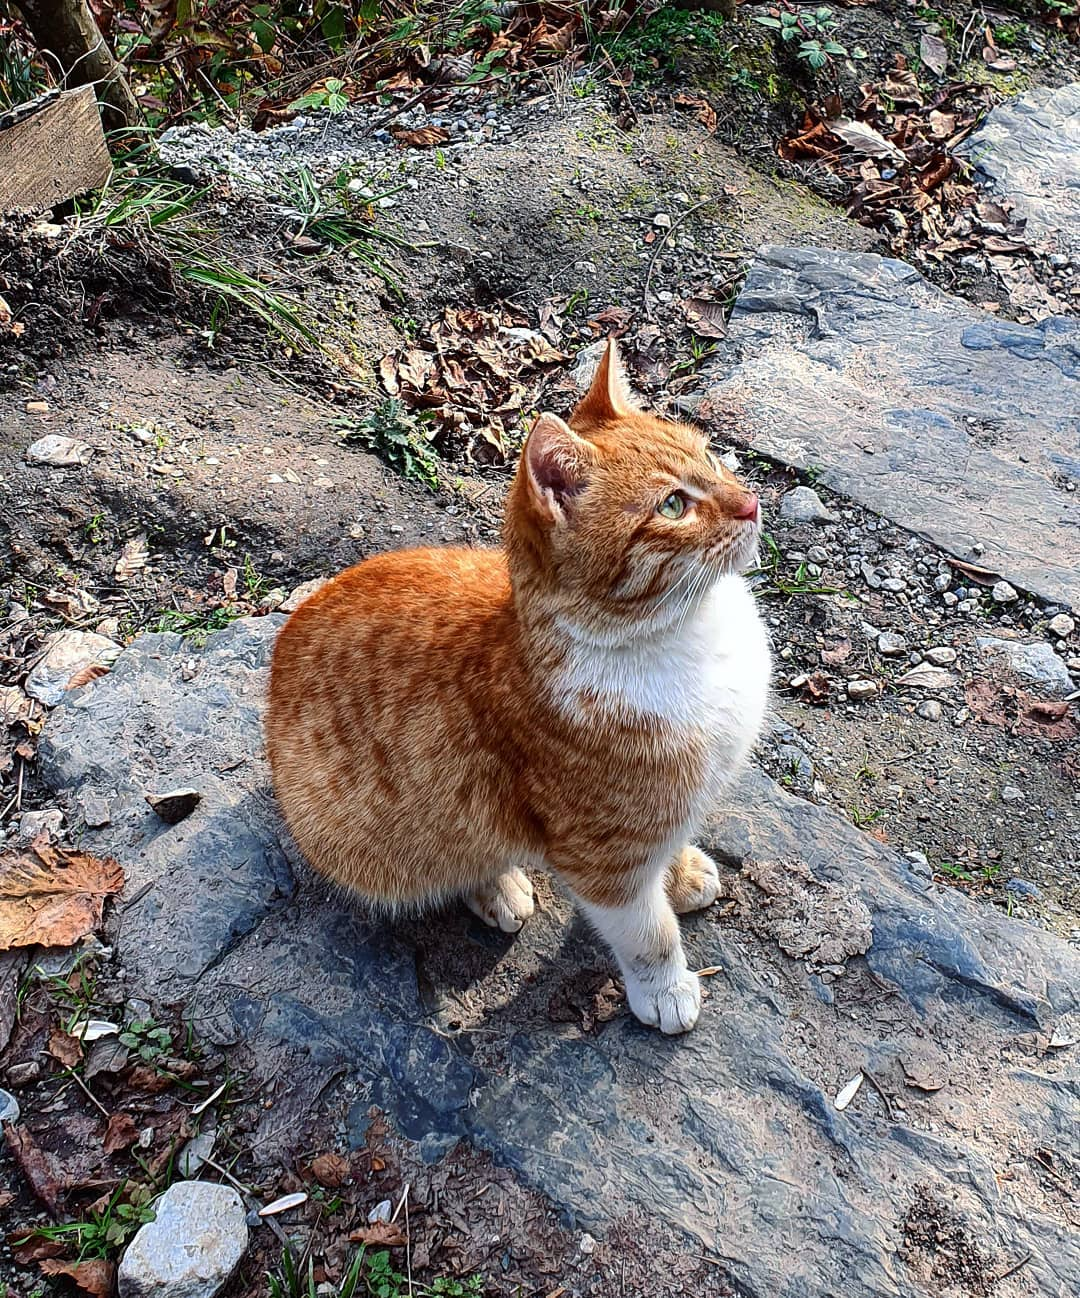 #cat #گربه #فالور #فالوور_رایگان #بیکار #الاف #فوضول #مهربون #دنبال_کردن #همراه